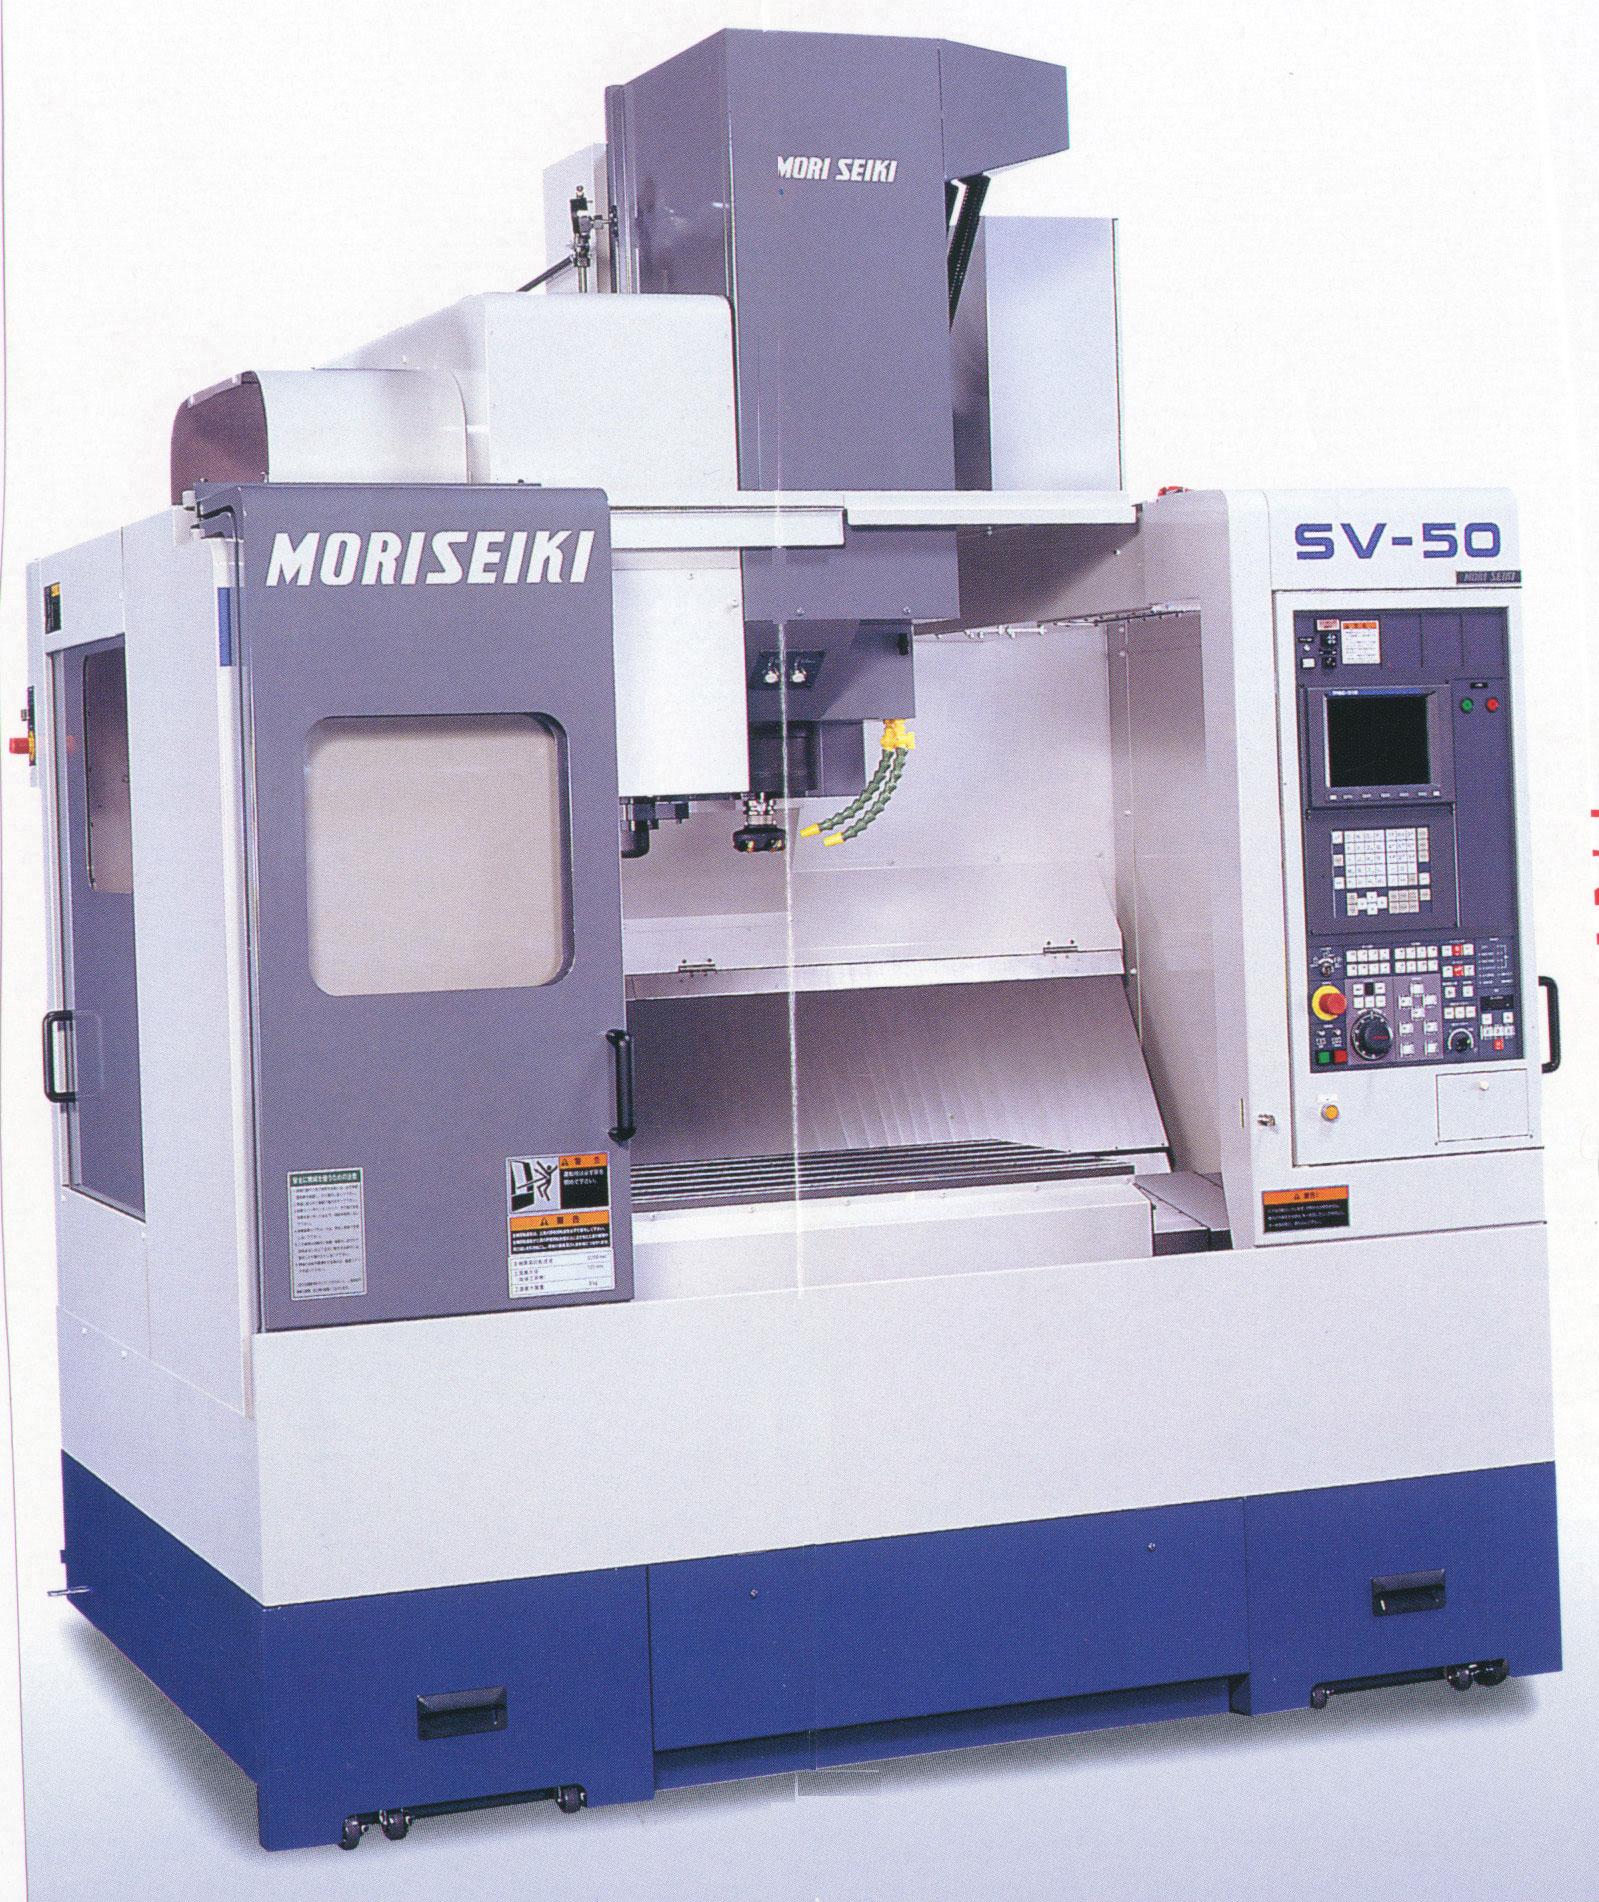 Mori Seiki SV-50 - Vertical Machining Center